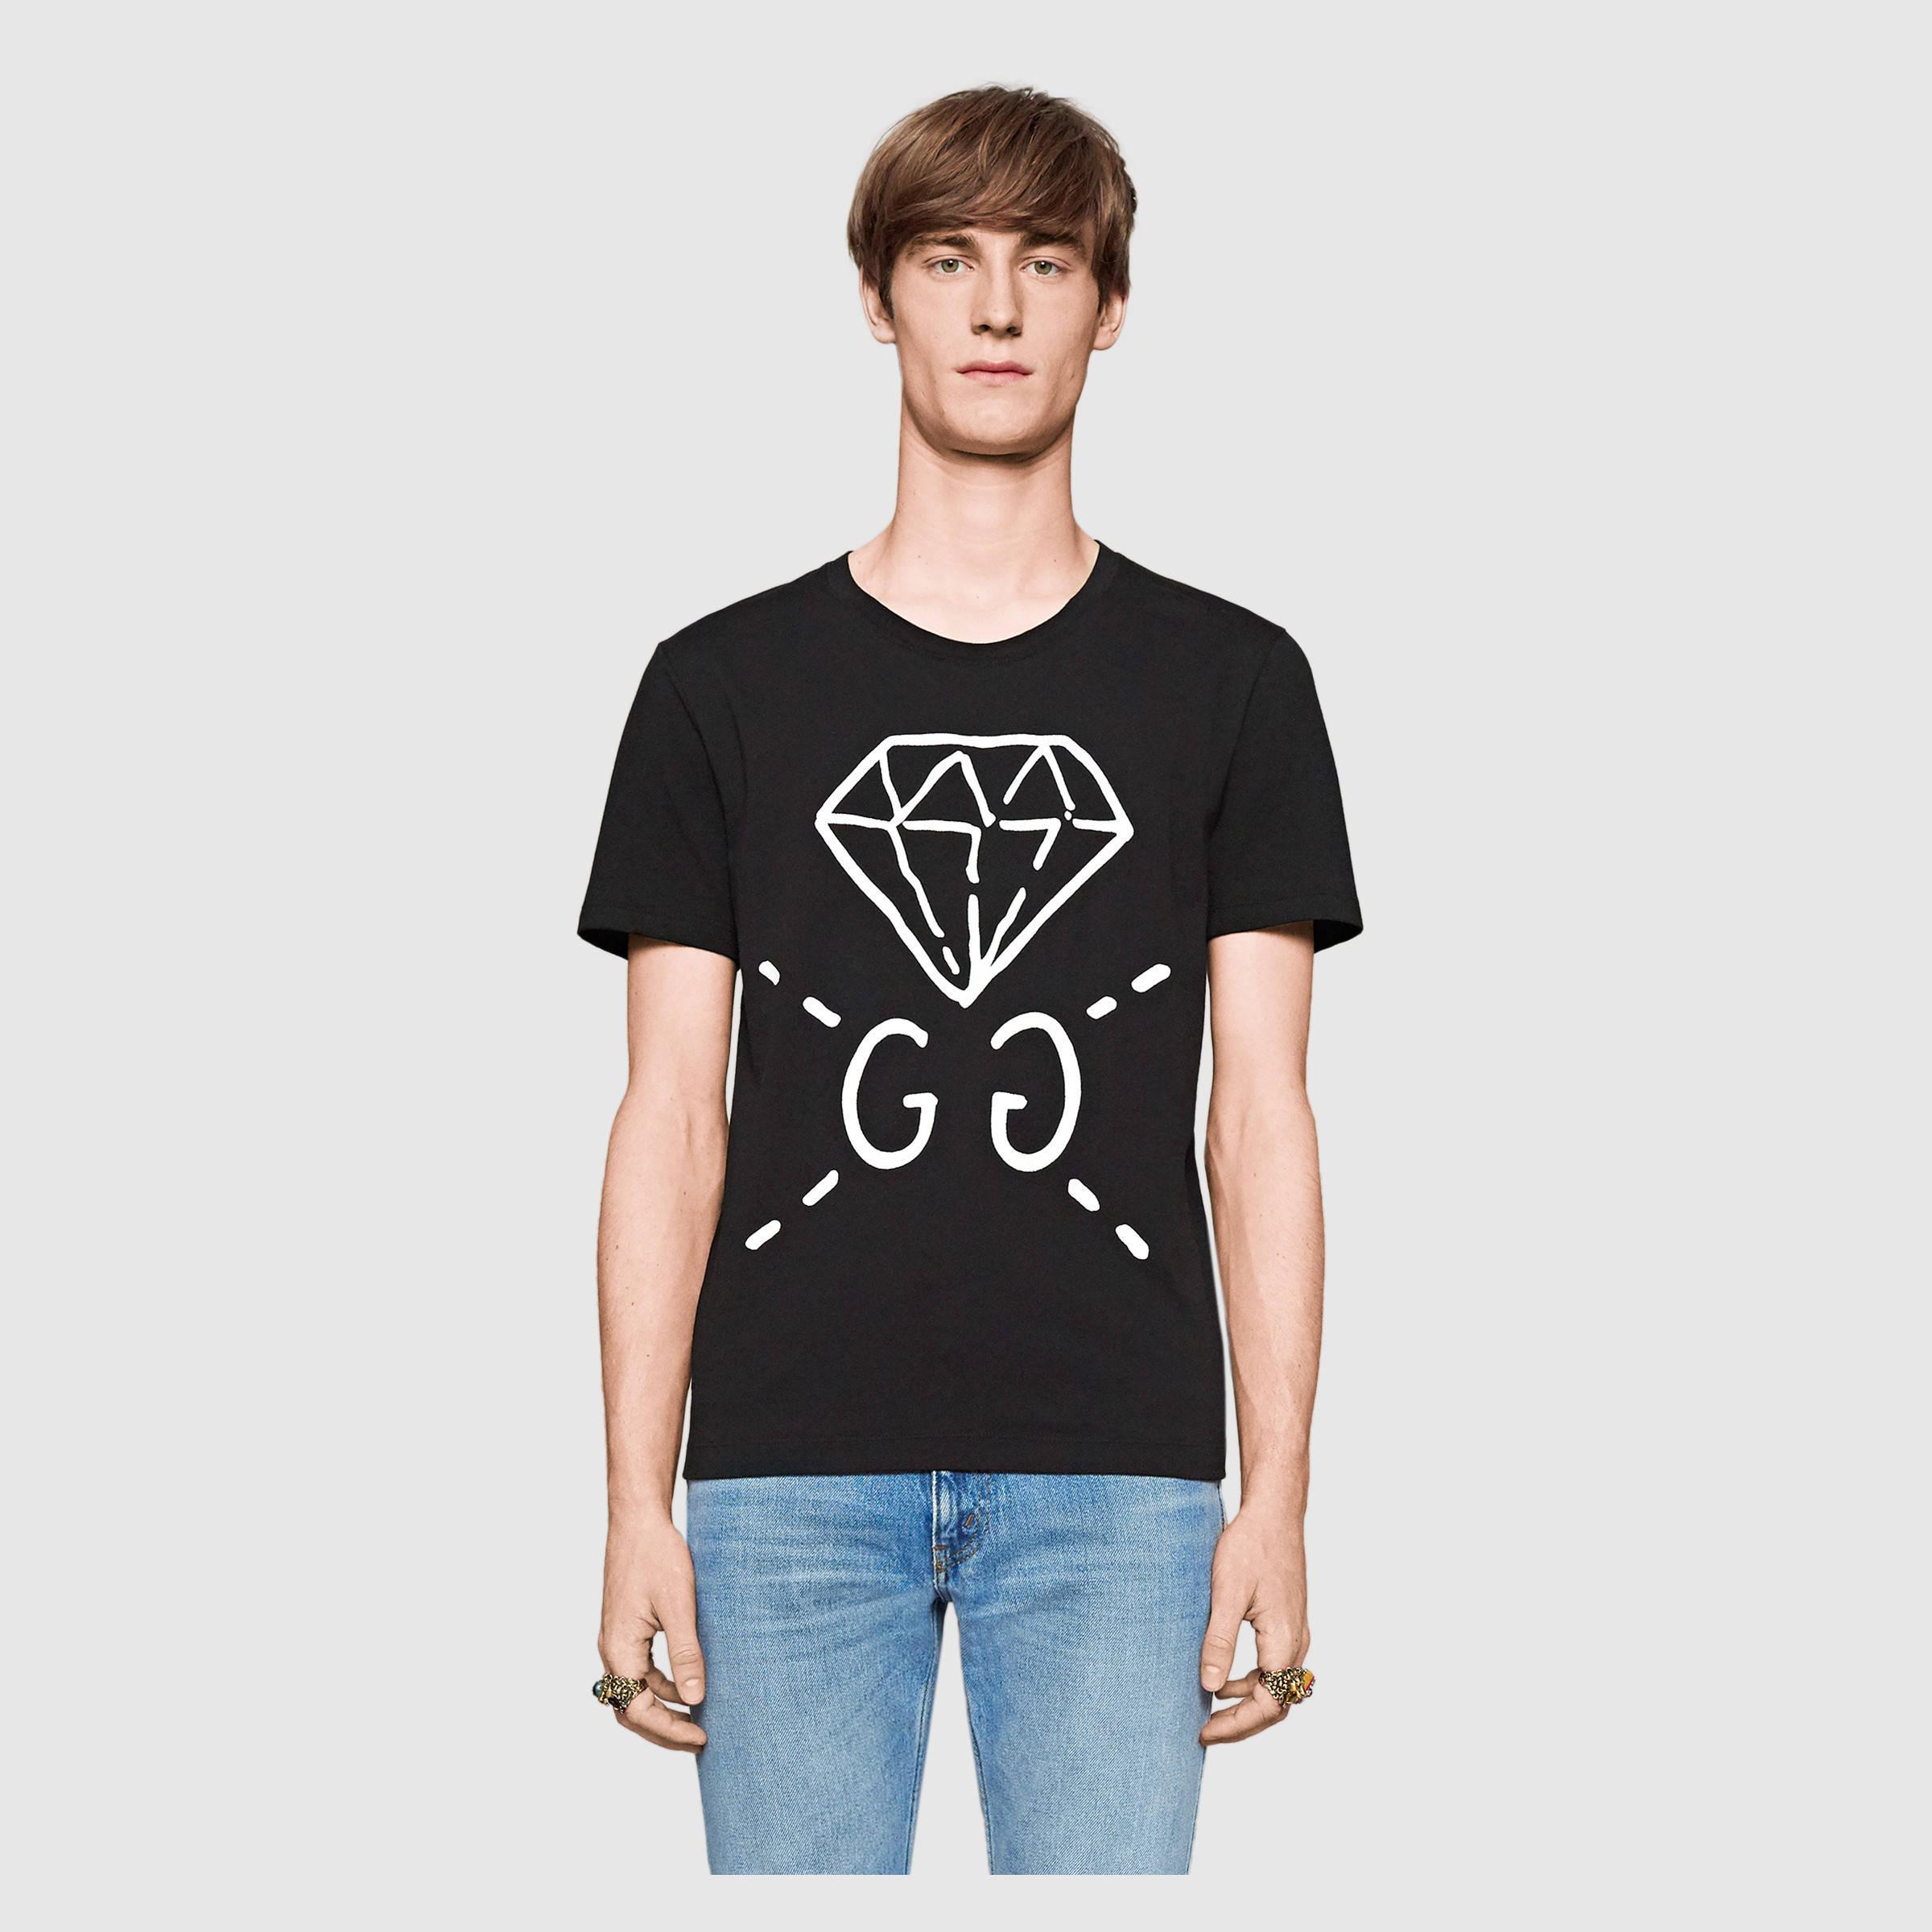 6b788fa13 Fake Black Gucci T Shirt